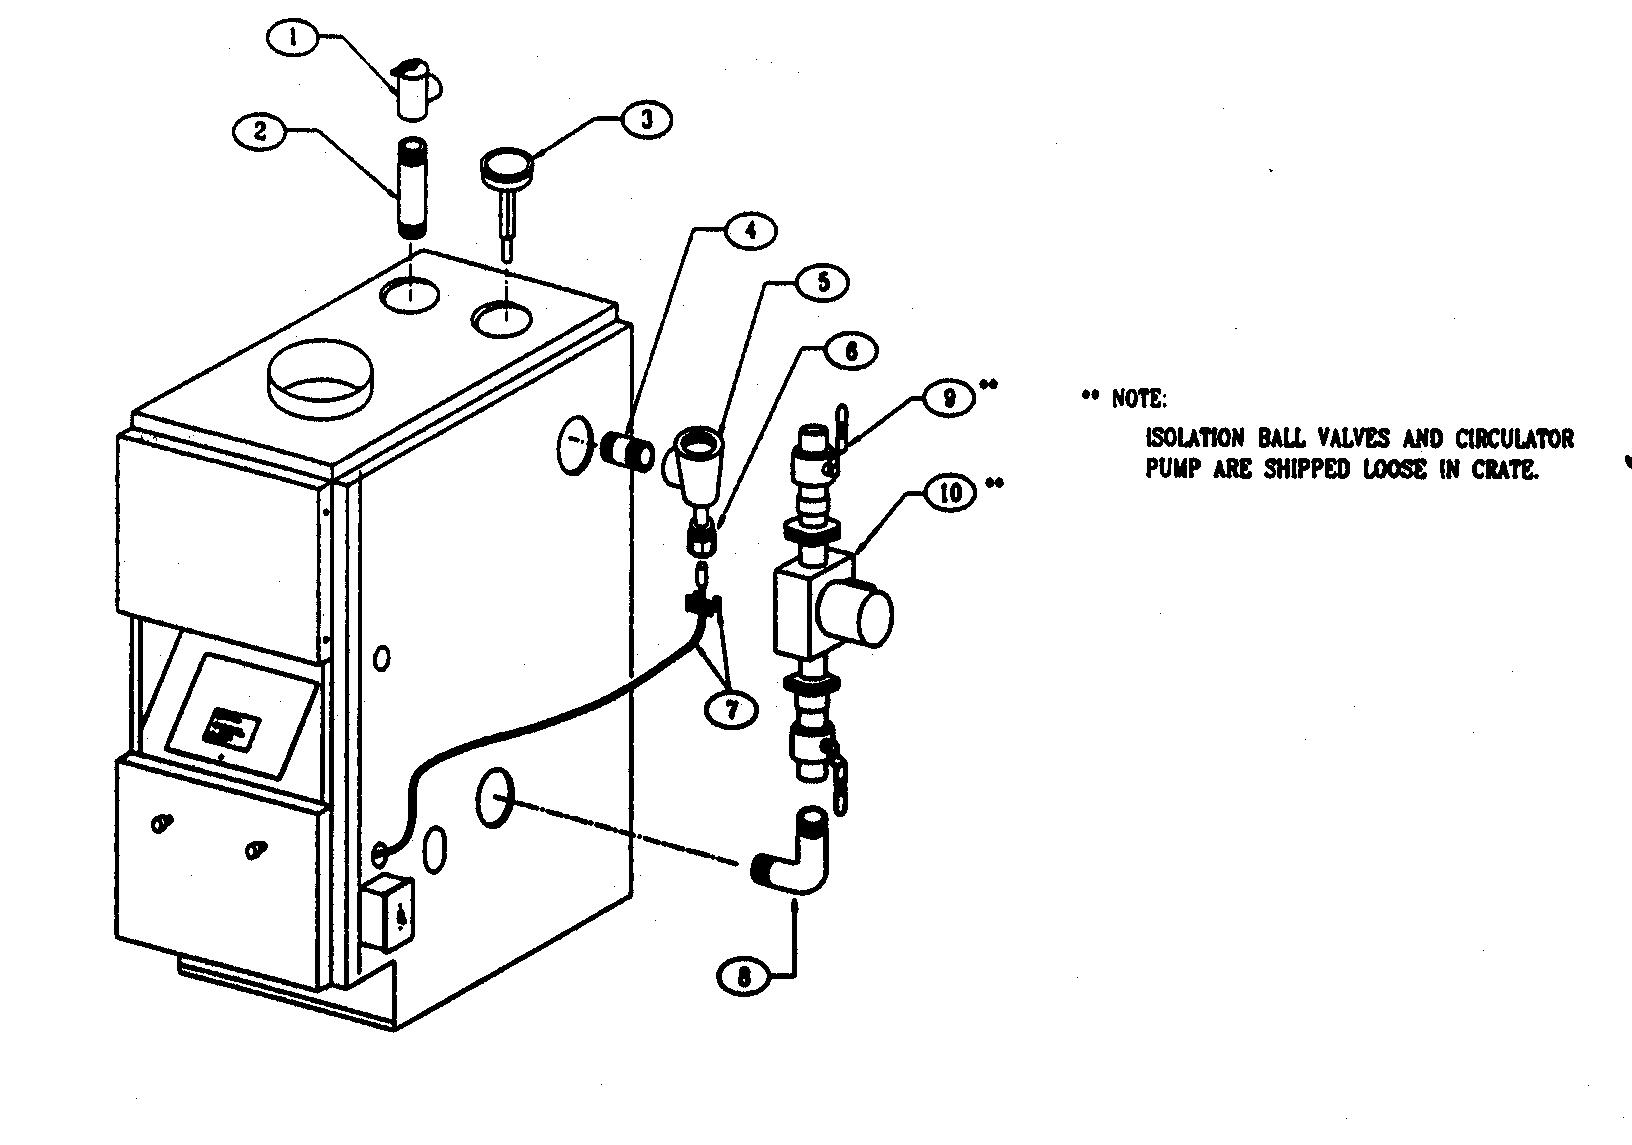 hight resolution of dunkirk model pwx 4vng2 boiler storage tanks genuine parts rh searspartsdirect com dunkirk boiler wiring diagram dunkirk gas boiler diagram